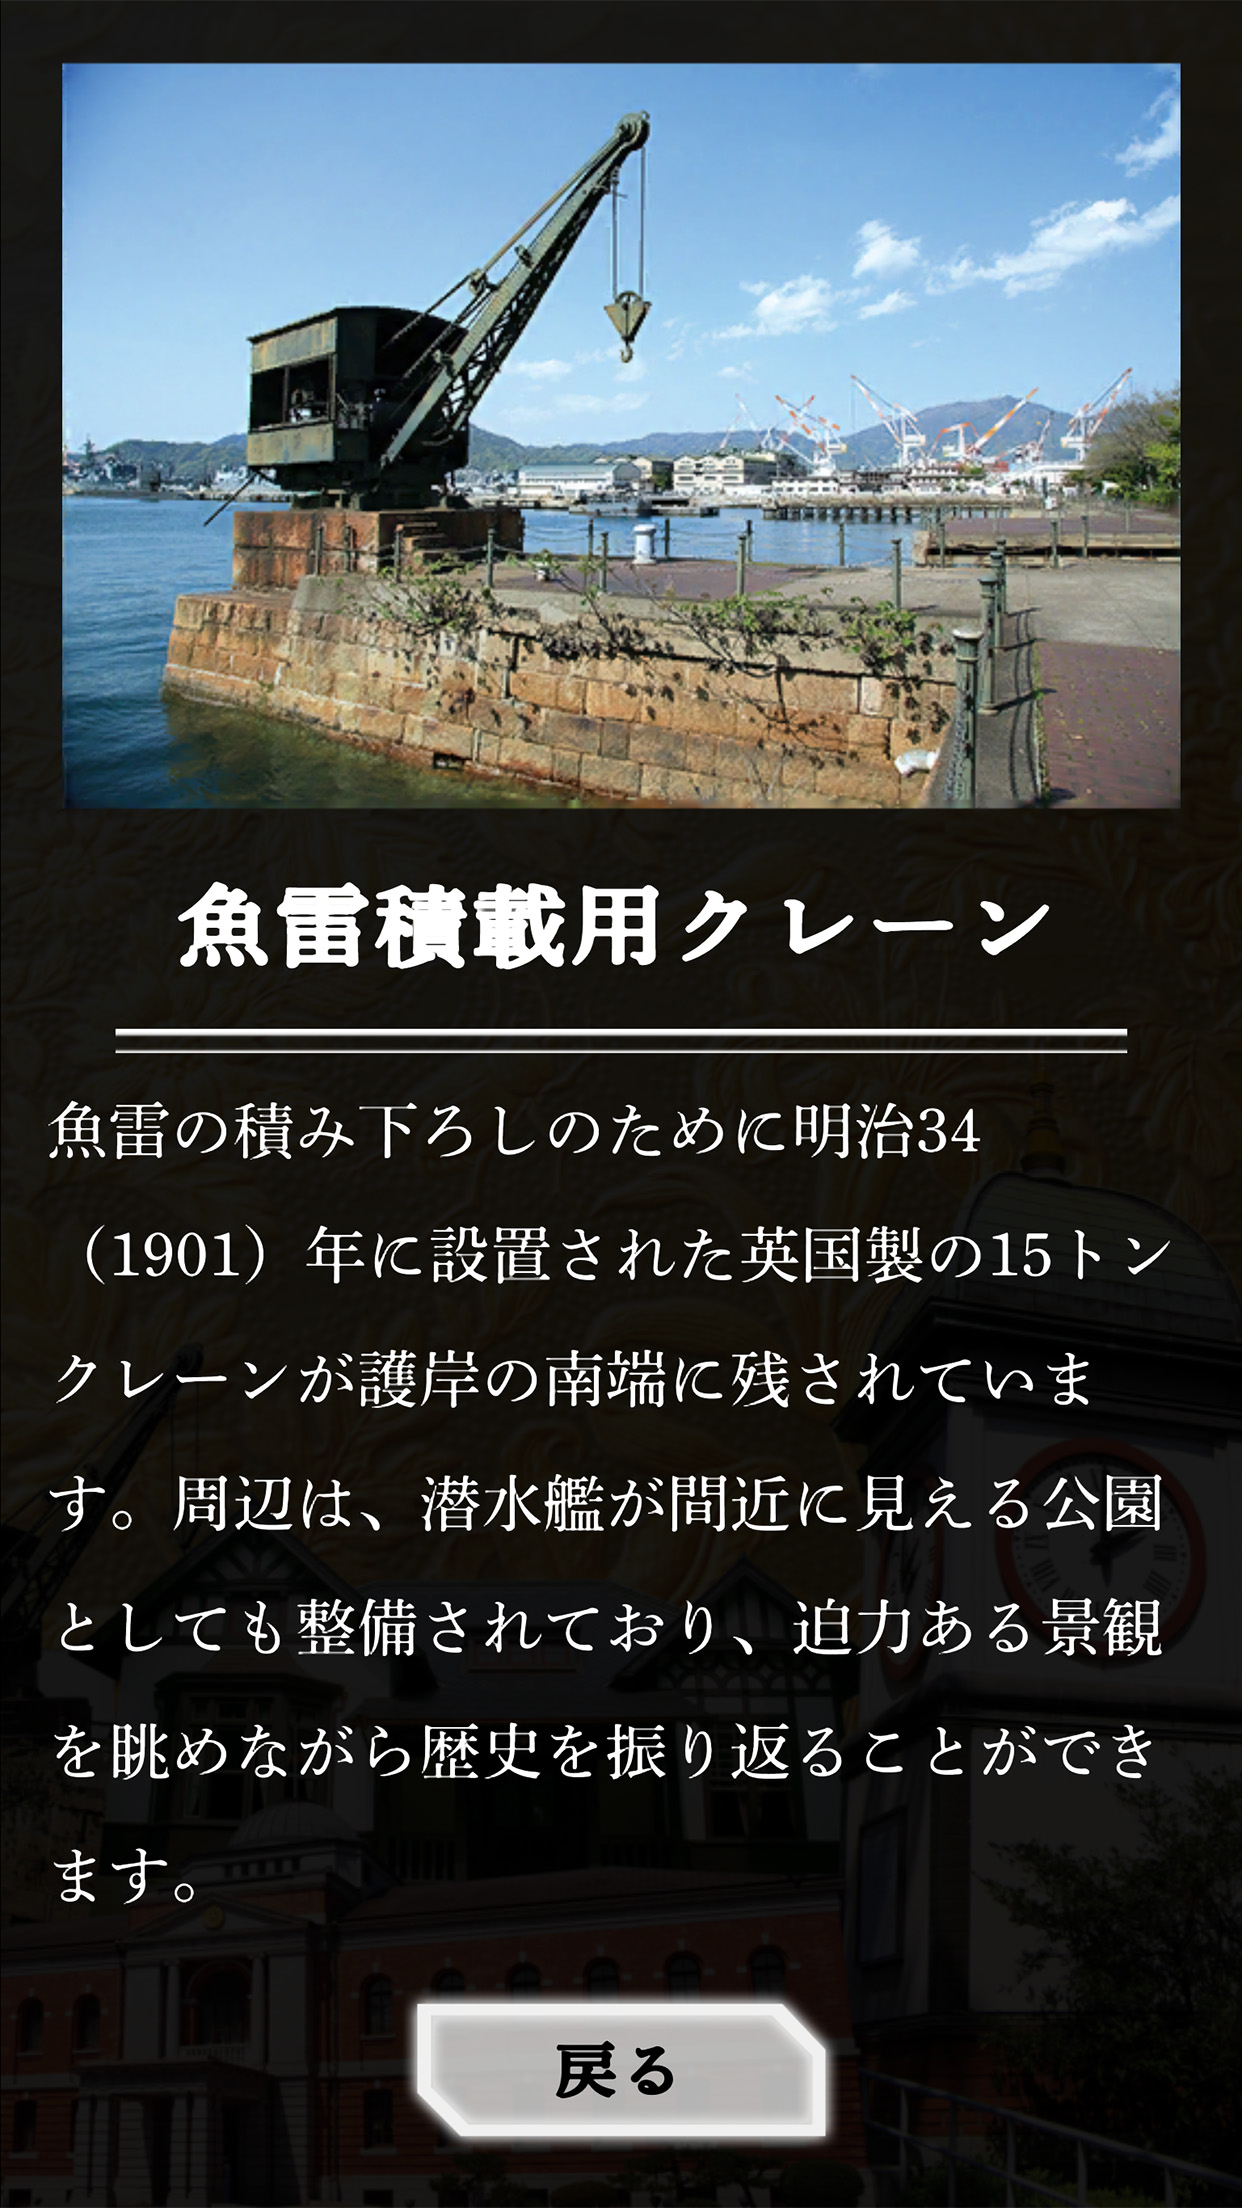 解説画面例(魚雷積載用クレーン)